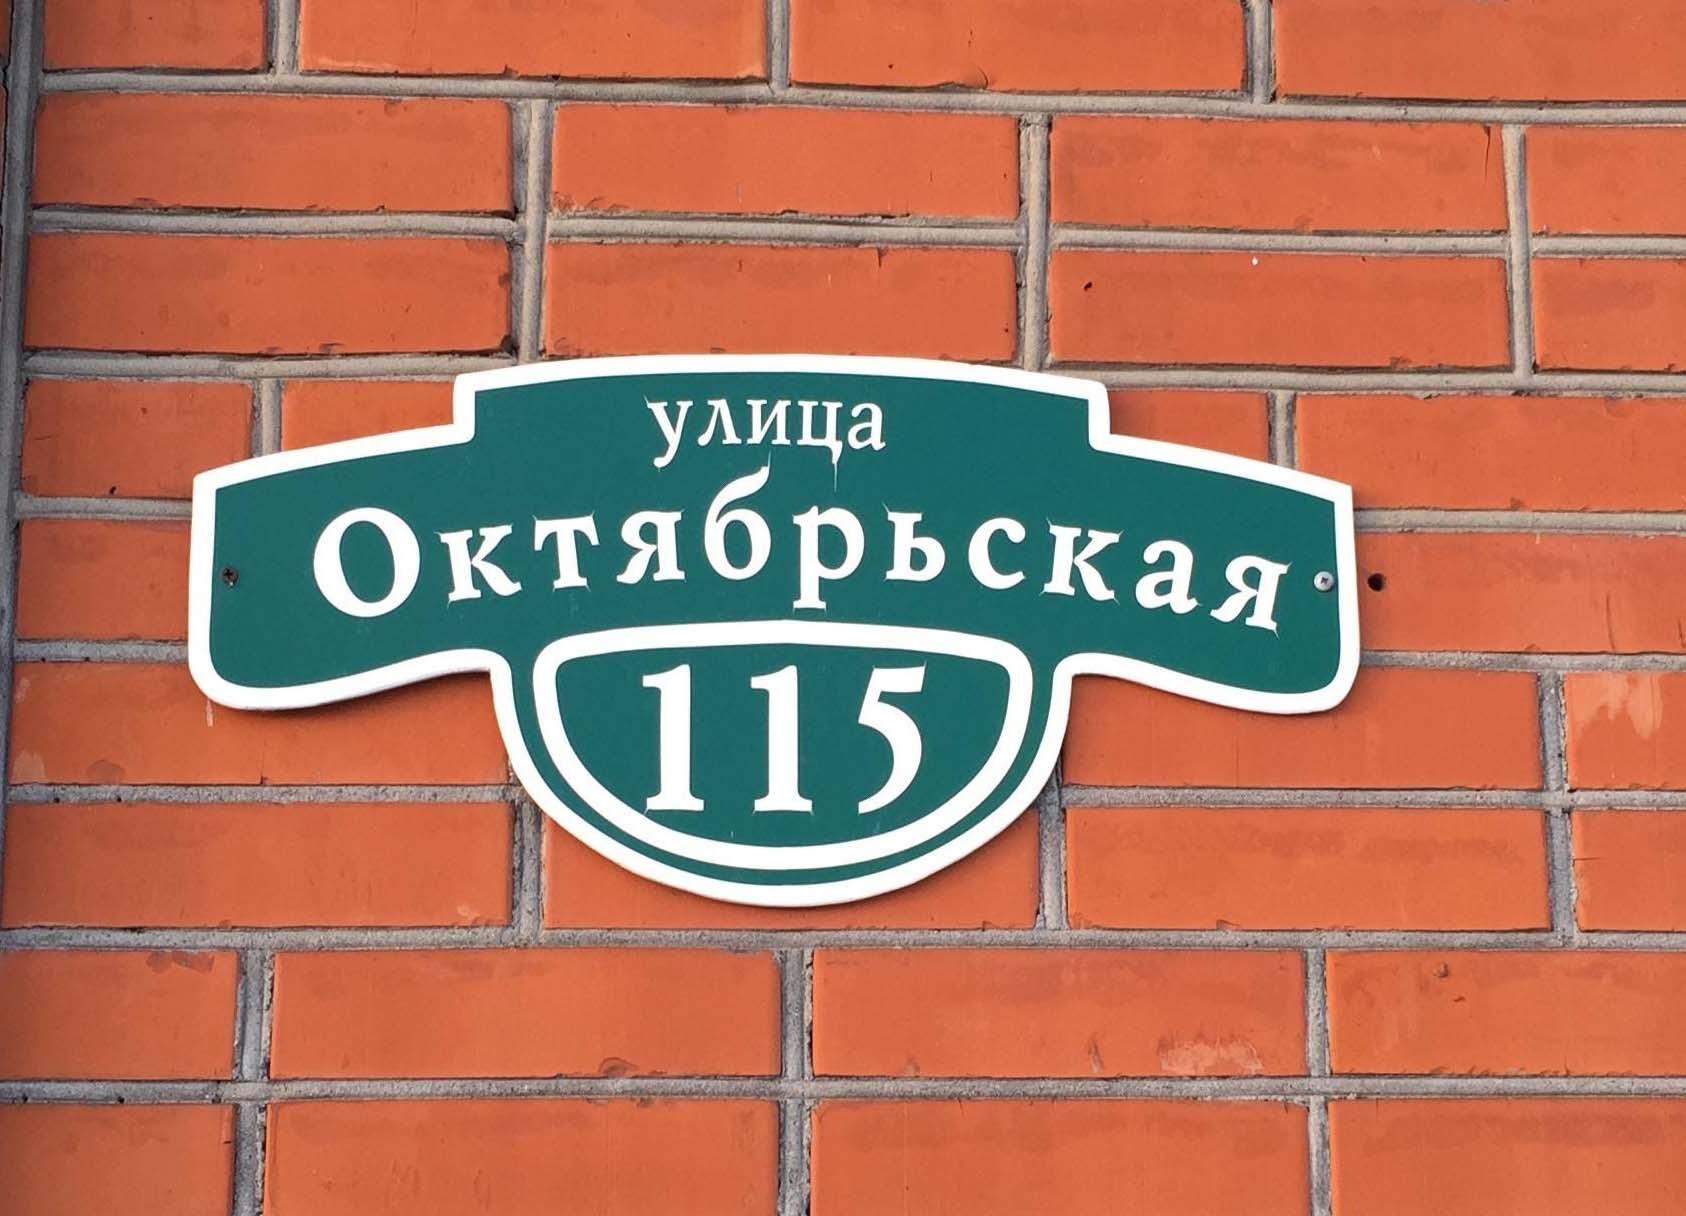 Изменение номера дома - адвокатские рекомендации от сервиса 98